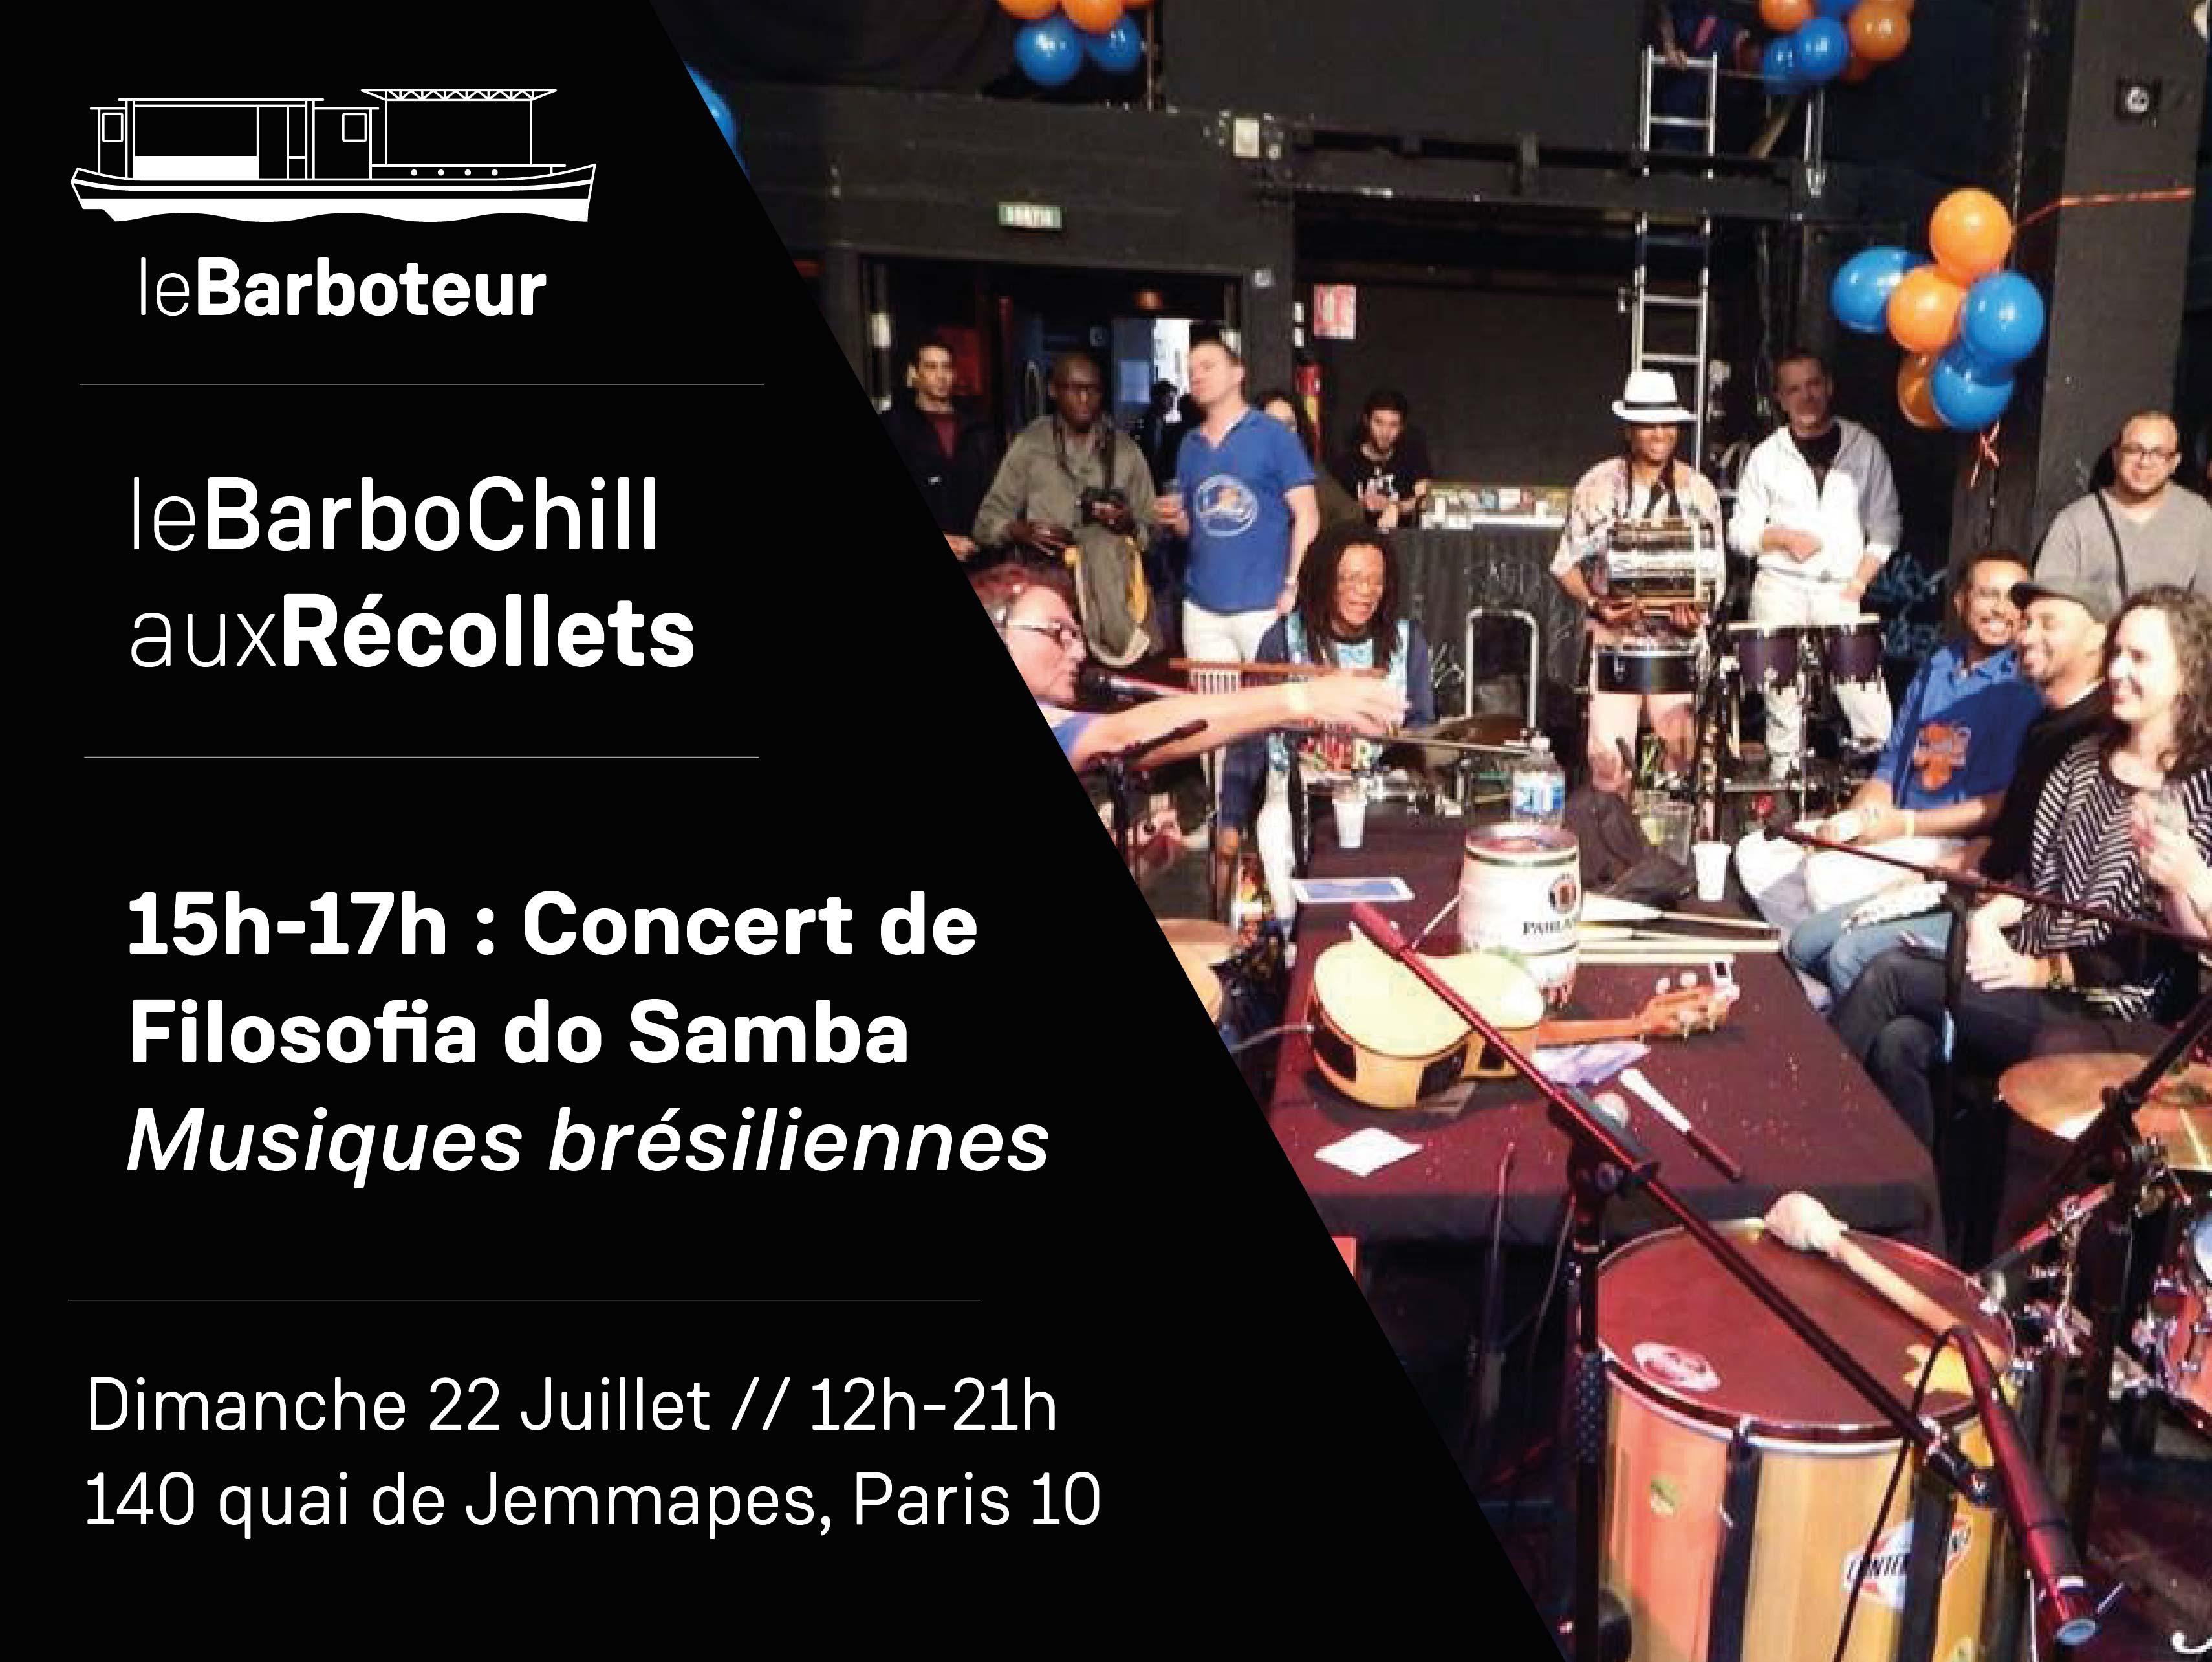 Filosofia do Samba en concert